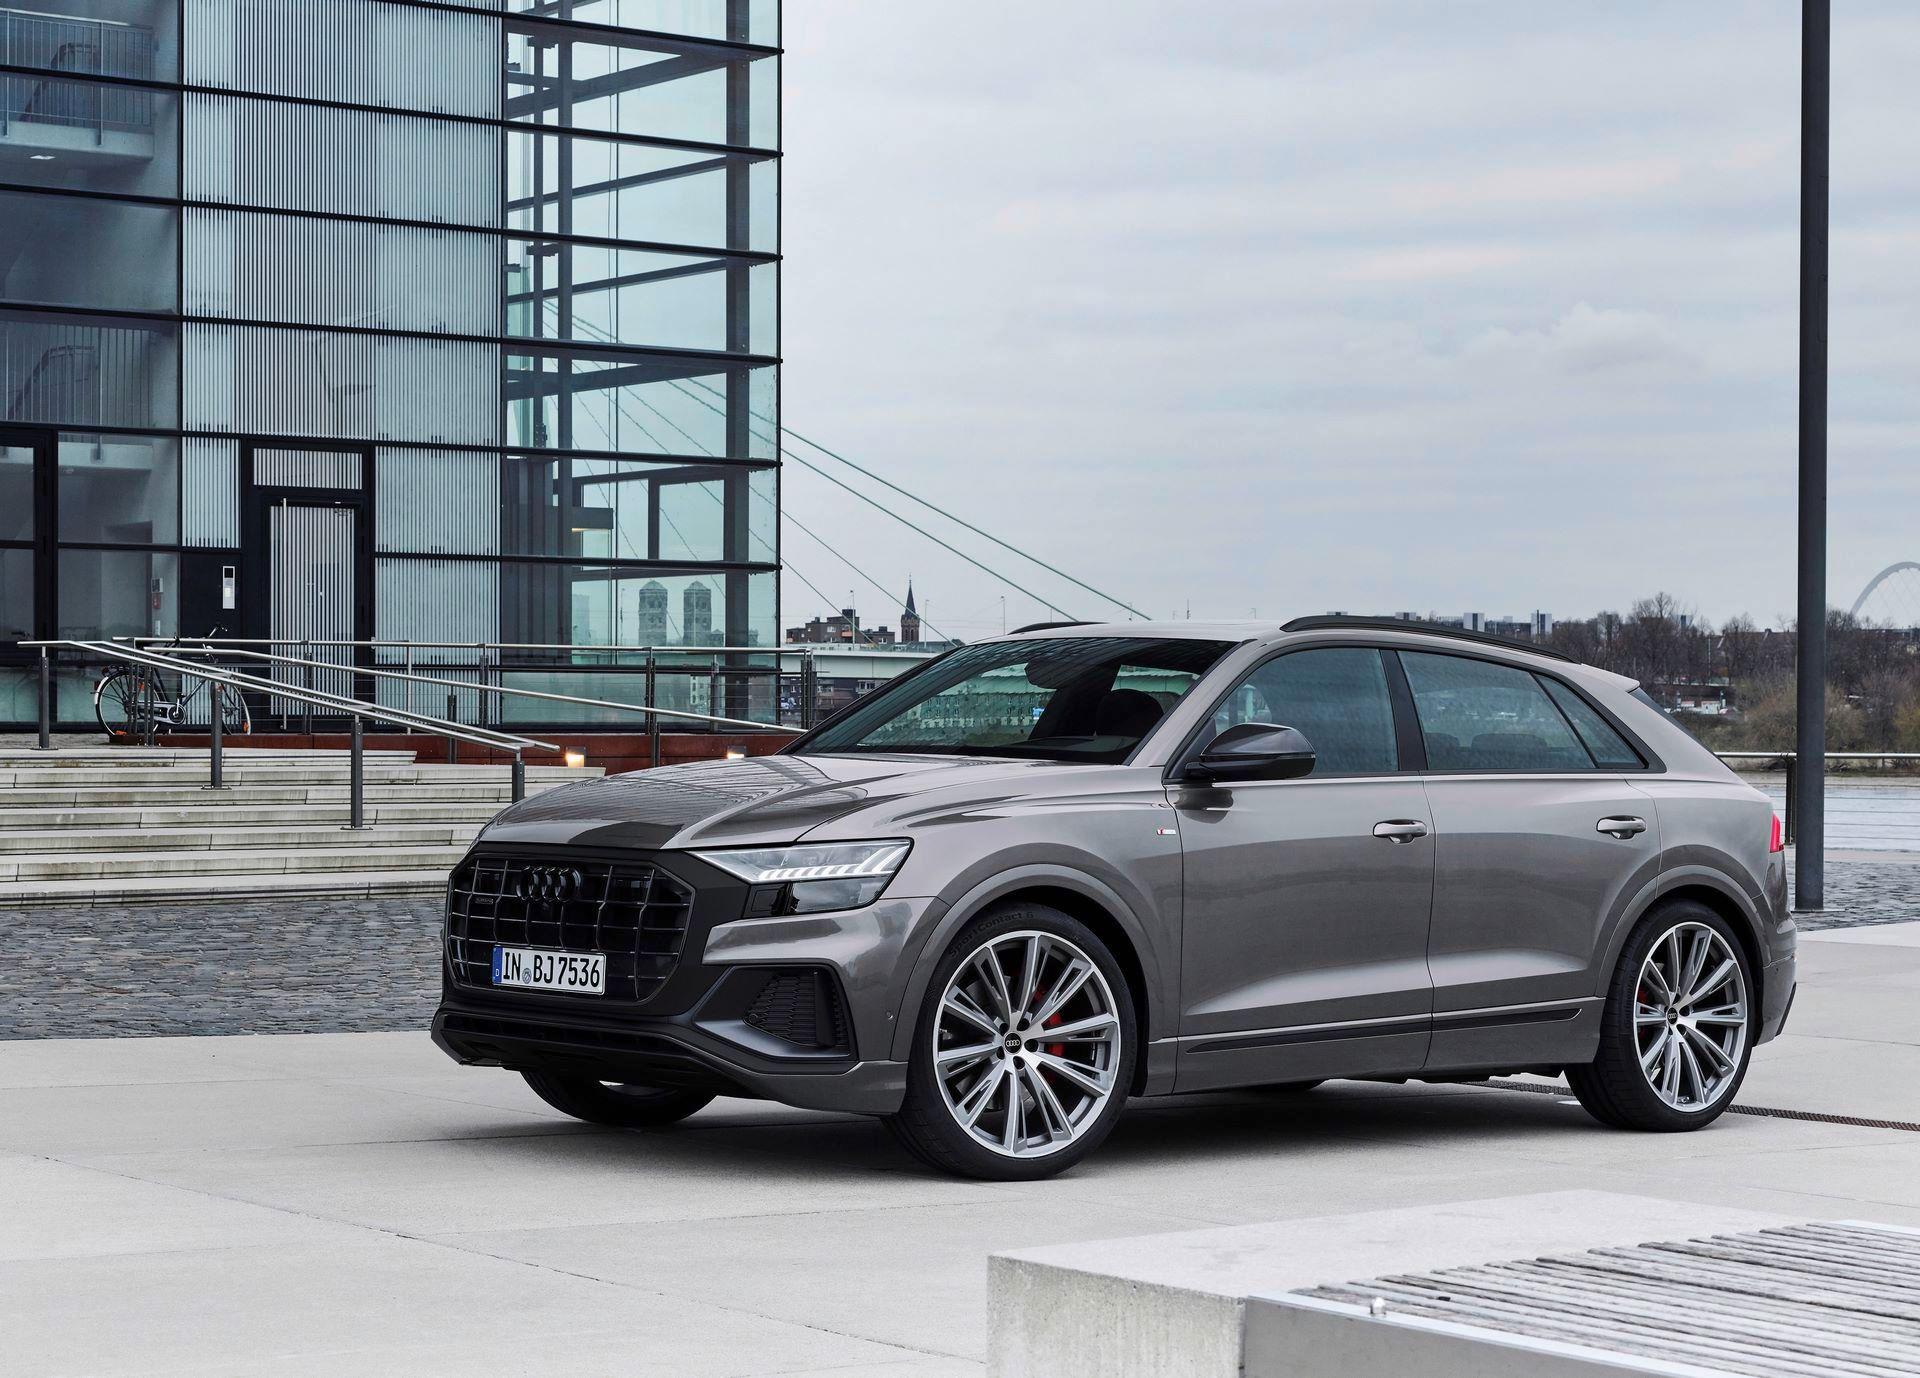 Audi-A4-A5-Q7-Q8-Competition-And-Competition-Plus-Trims-6